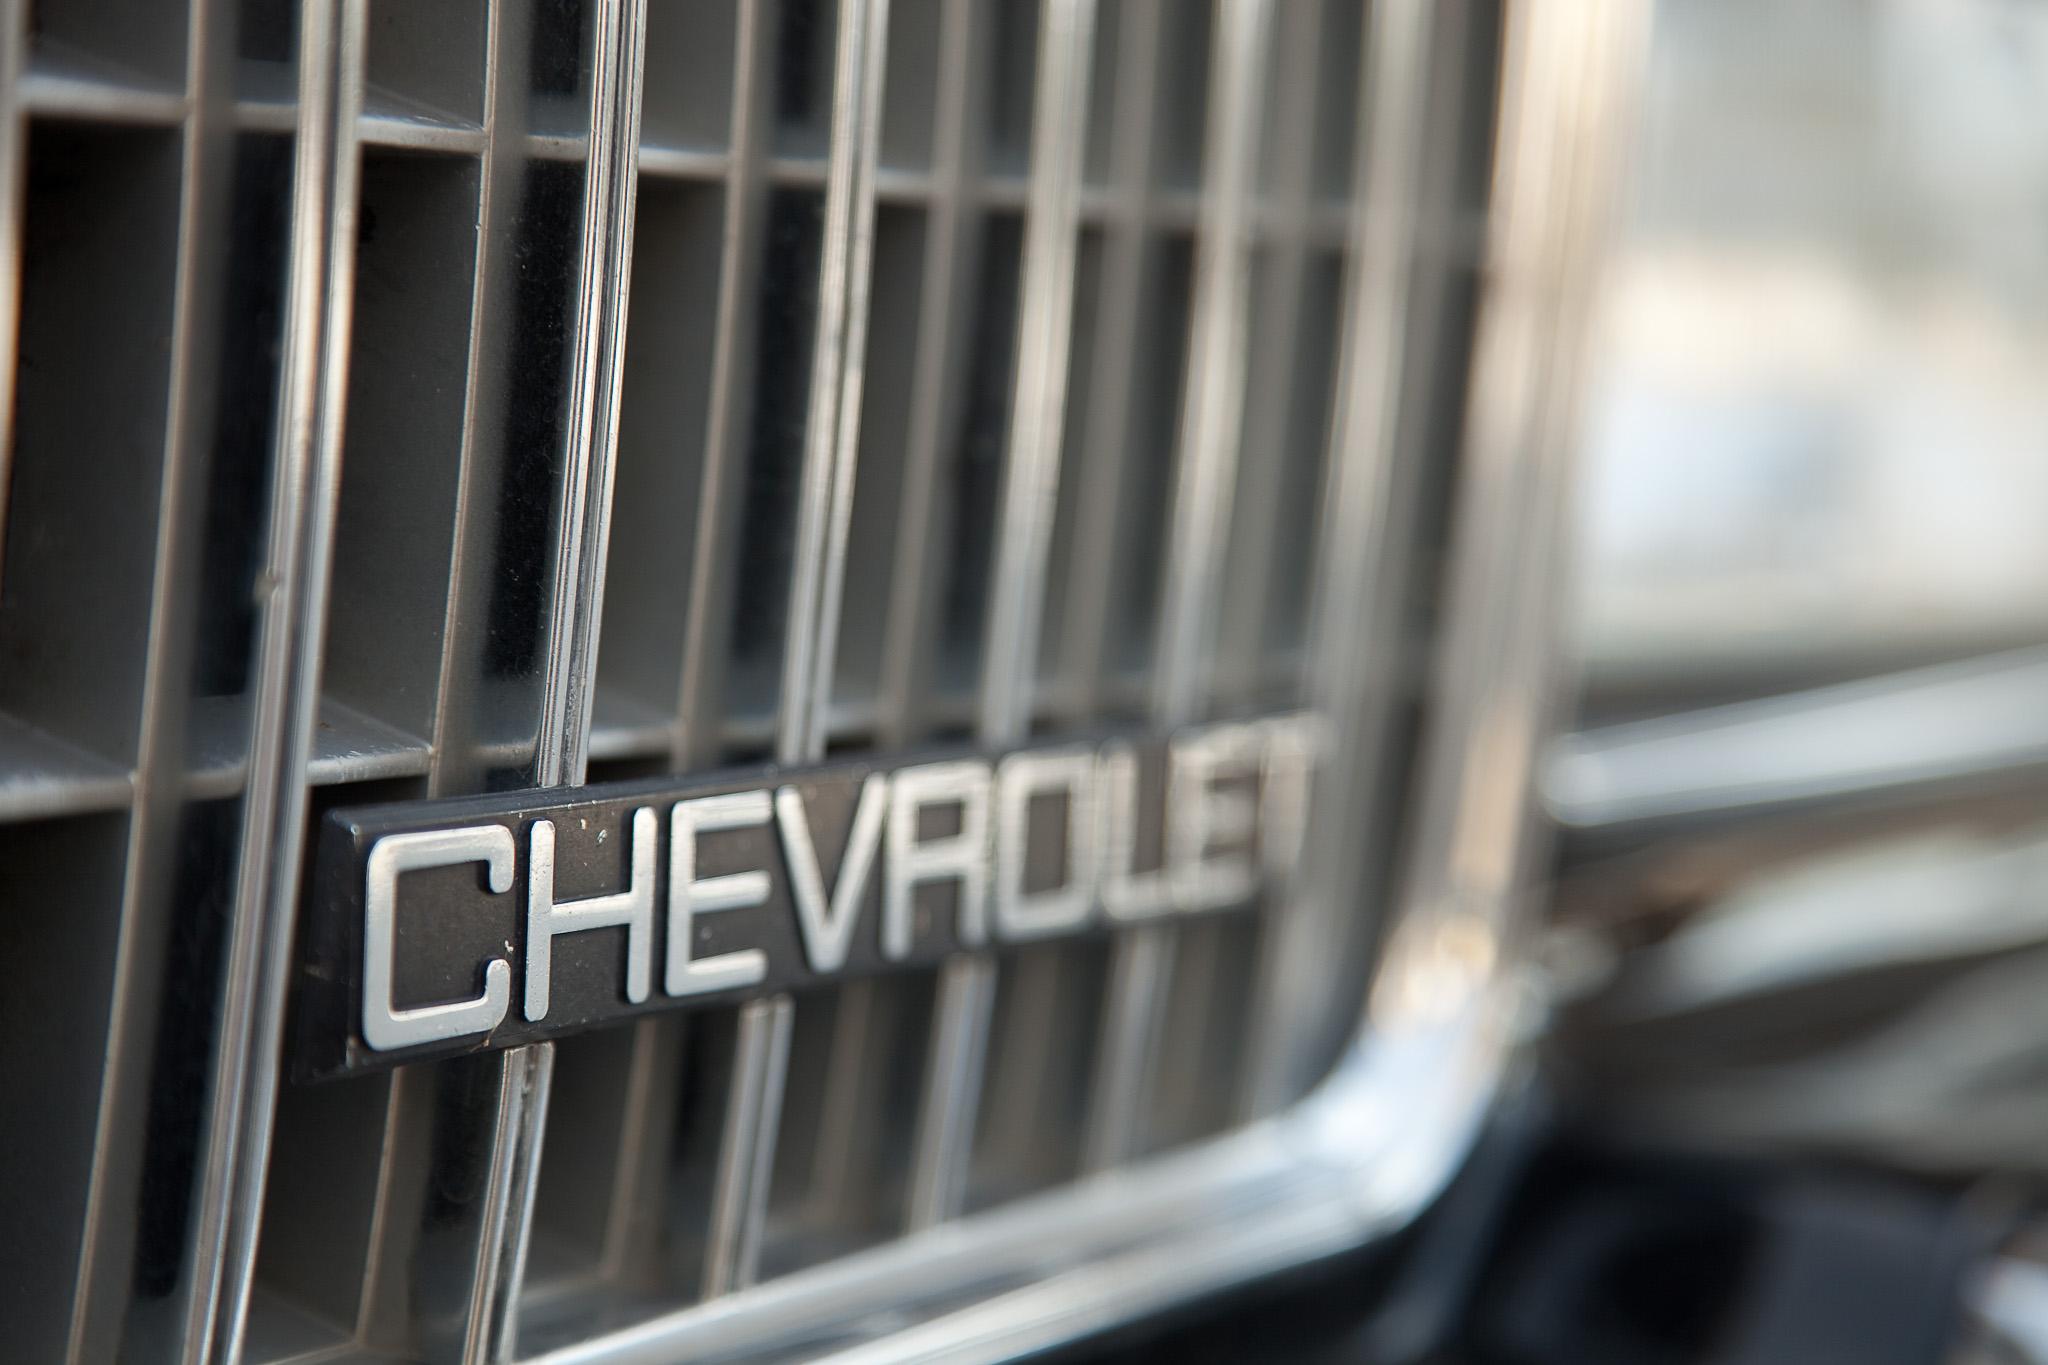 Mobilisti_Caprice_Chevrolet003